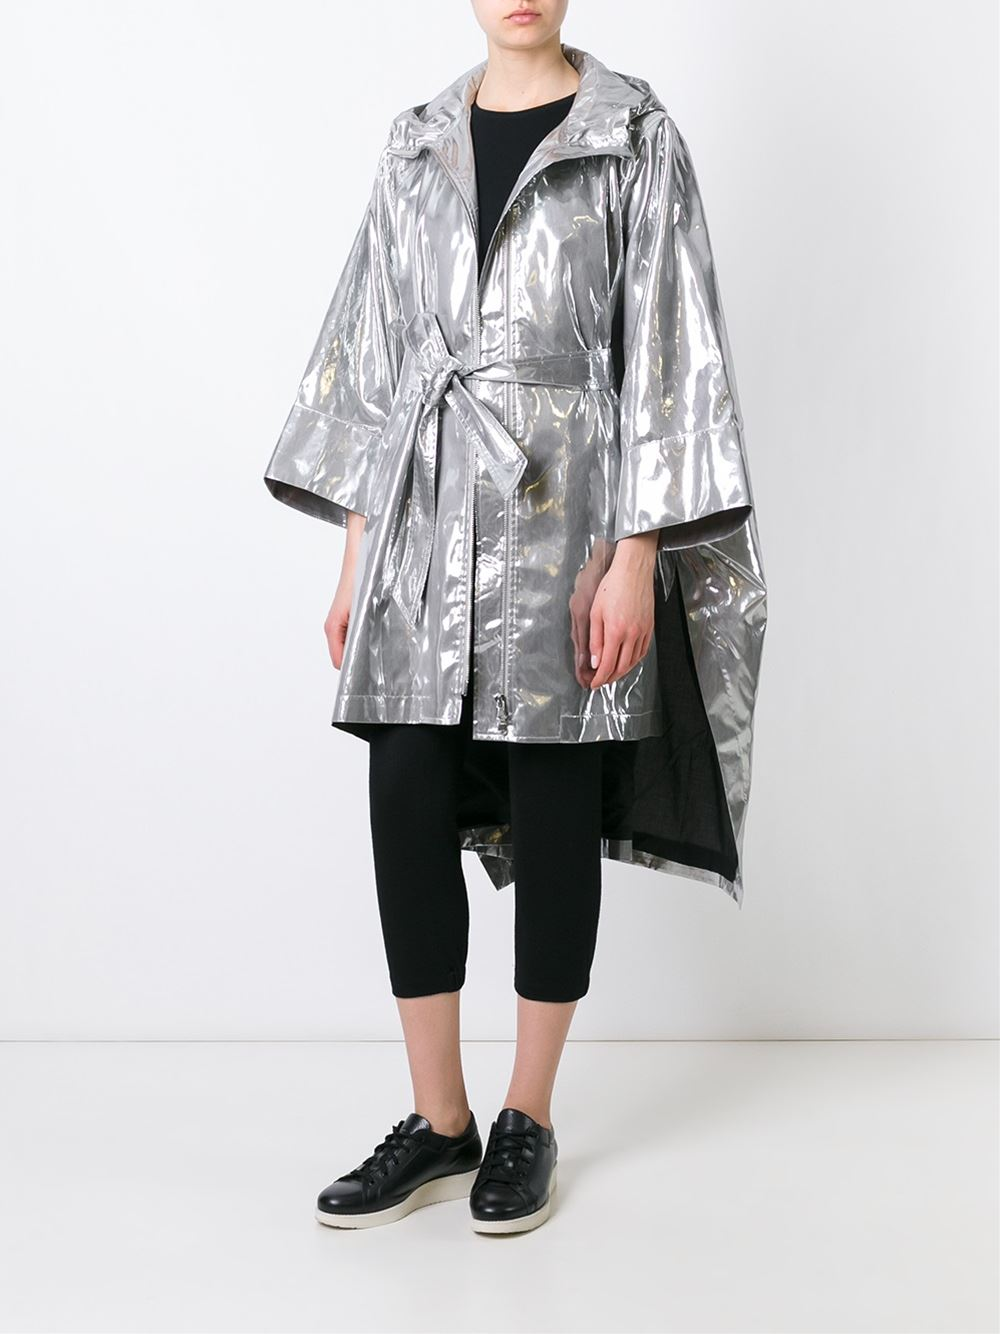 Here's The Wanda Nylon Cape Coat You'll Love To Wear When It Rains